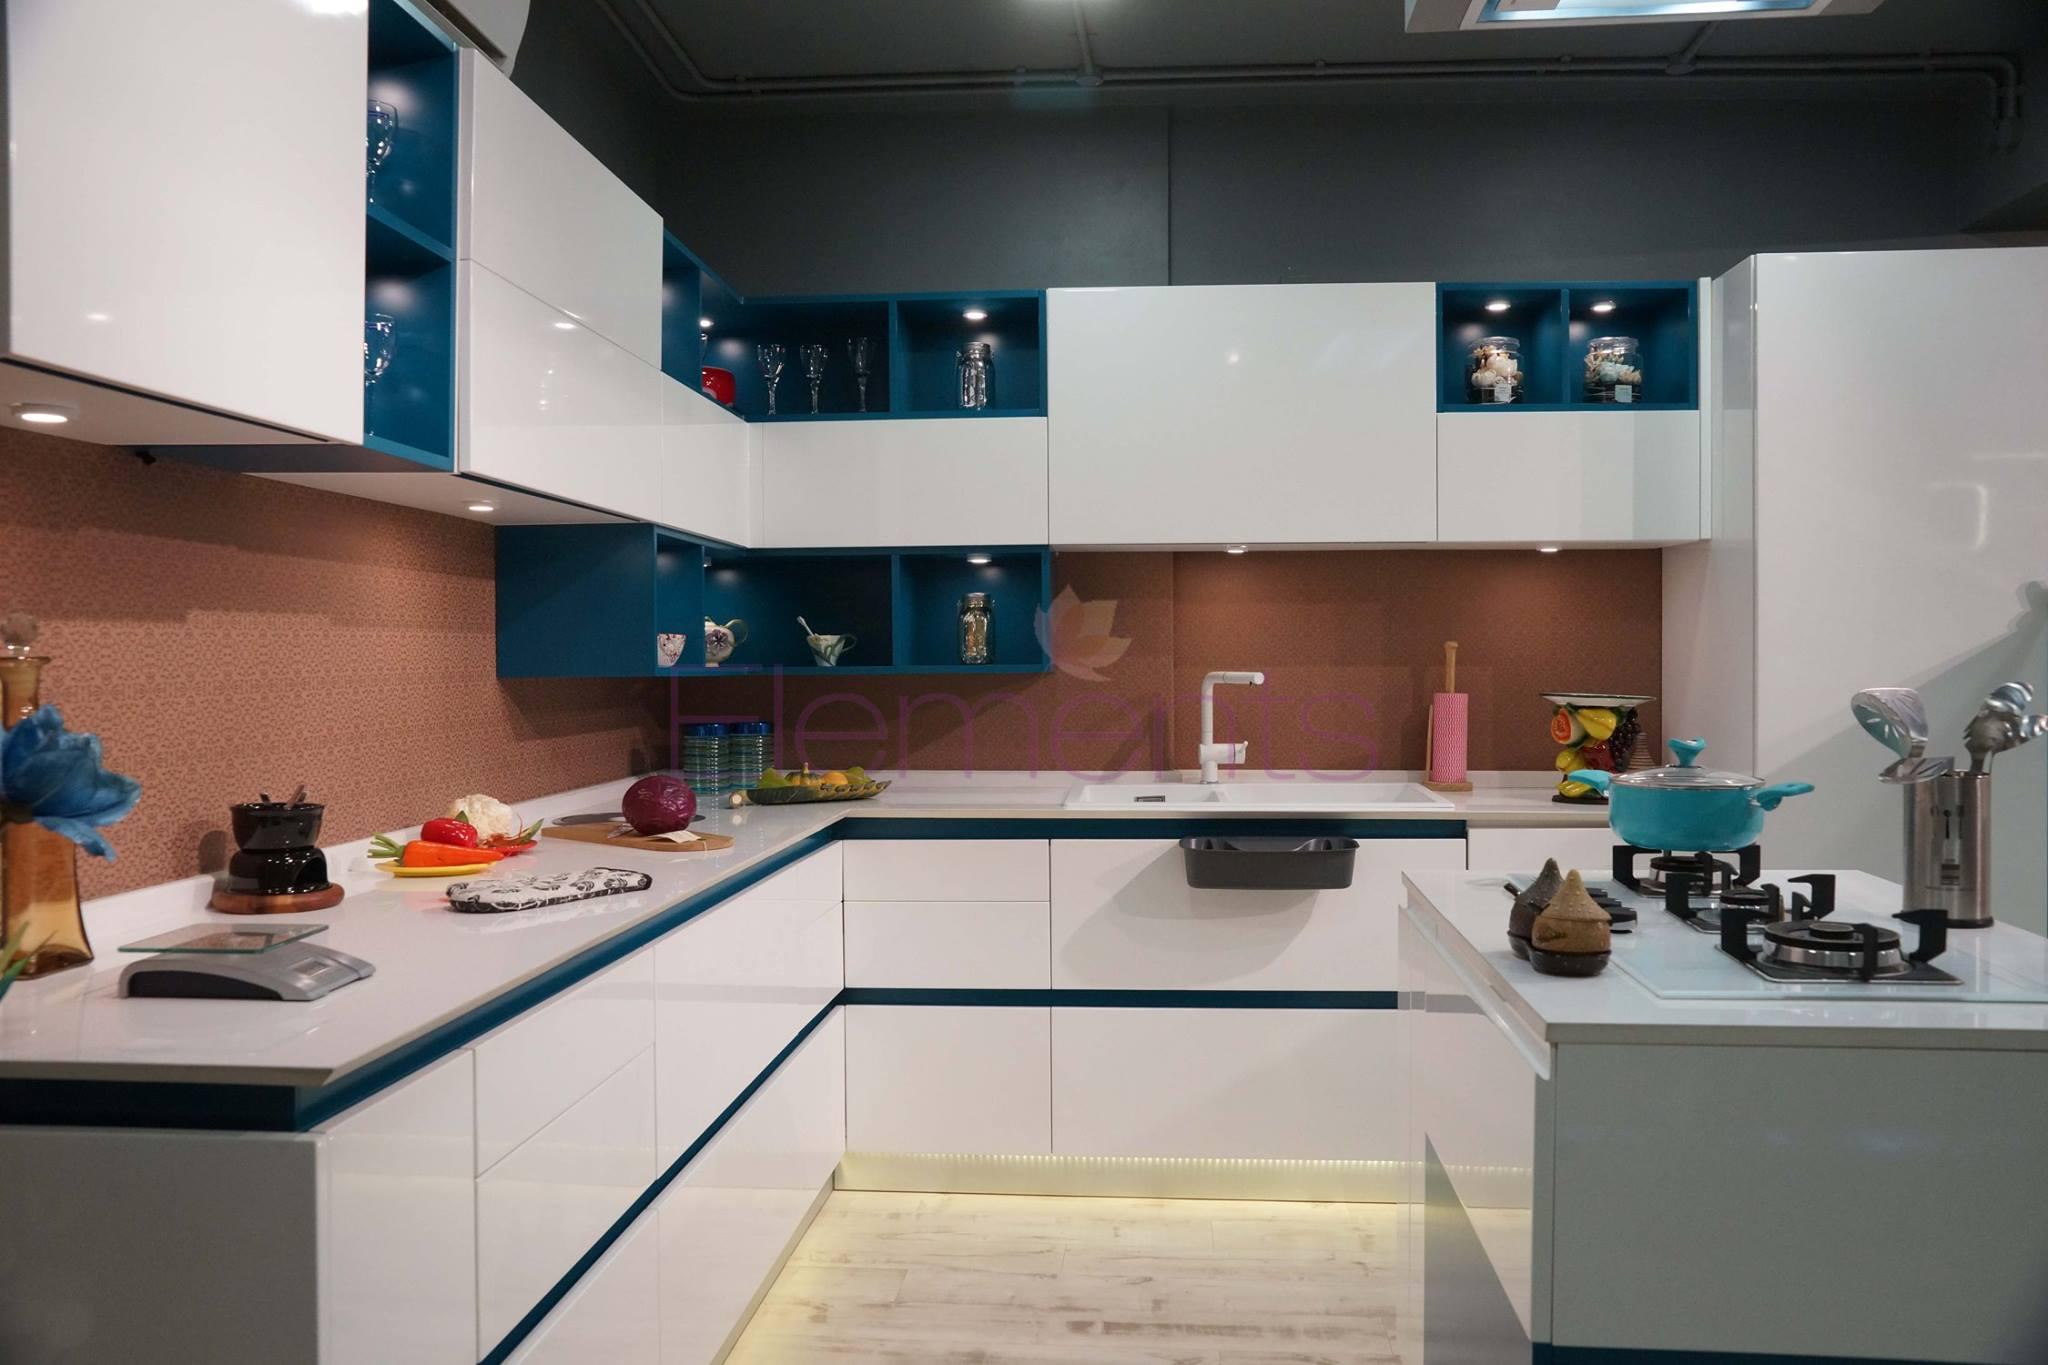 Gallery Latest Modular Kitchen Designs Of 2020 Elements